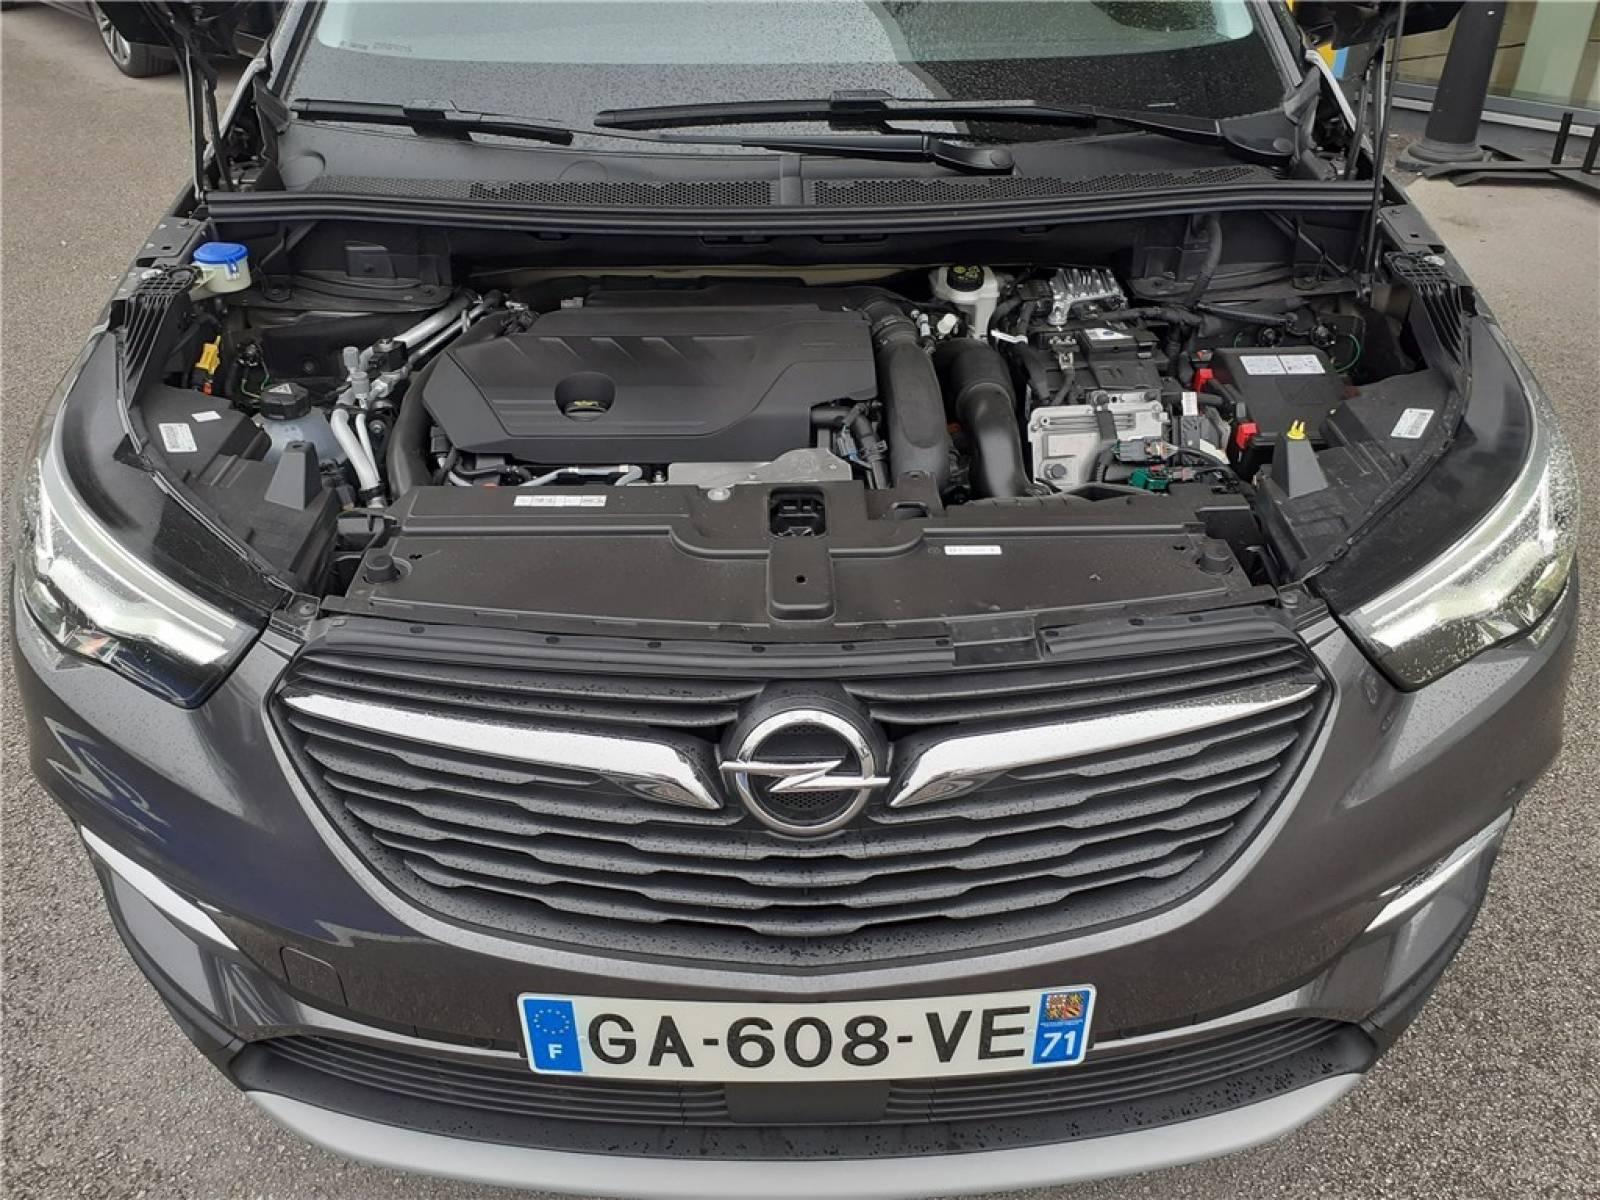 OPEL Grandland X Hybrid 225 ch BVA8 - véhicule d'occasion - Groupe Guillet - Opel Magicauto - Chalon-sur-Saône - 71380 - Saint-Marcel - 13